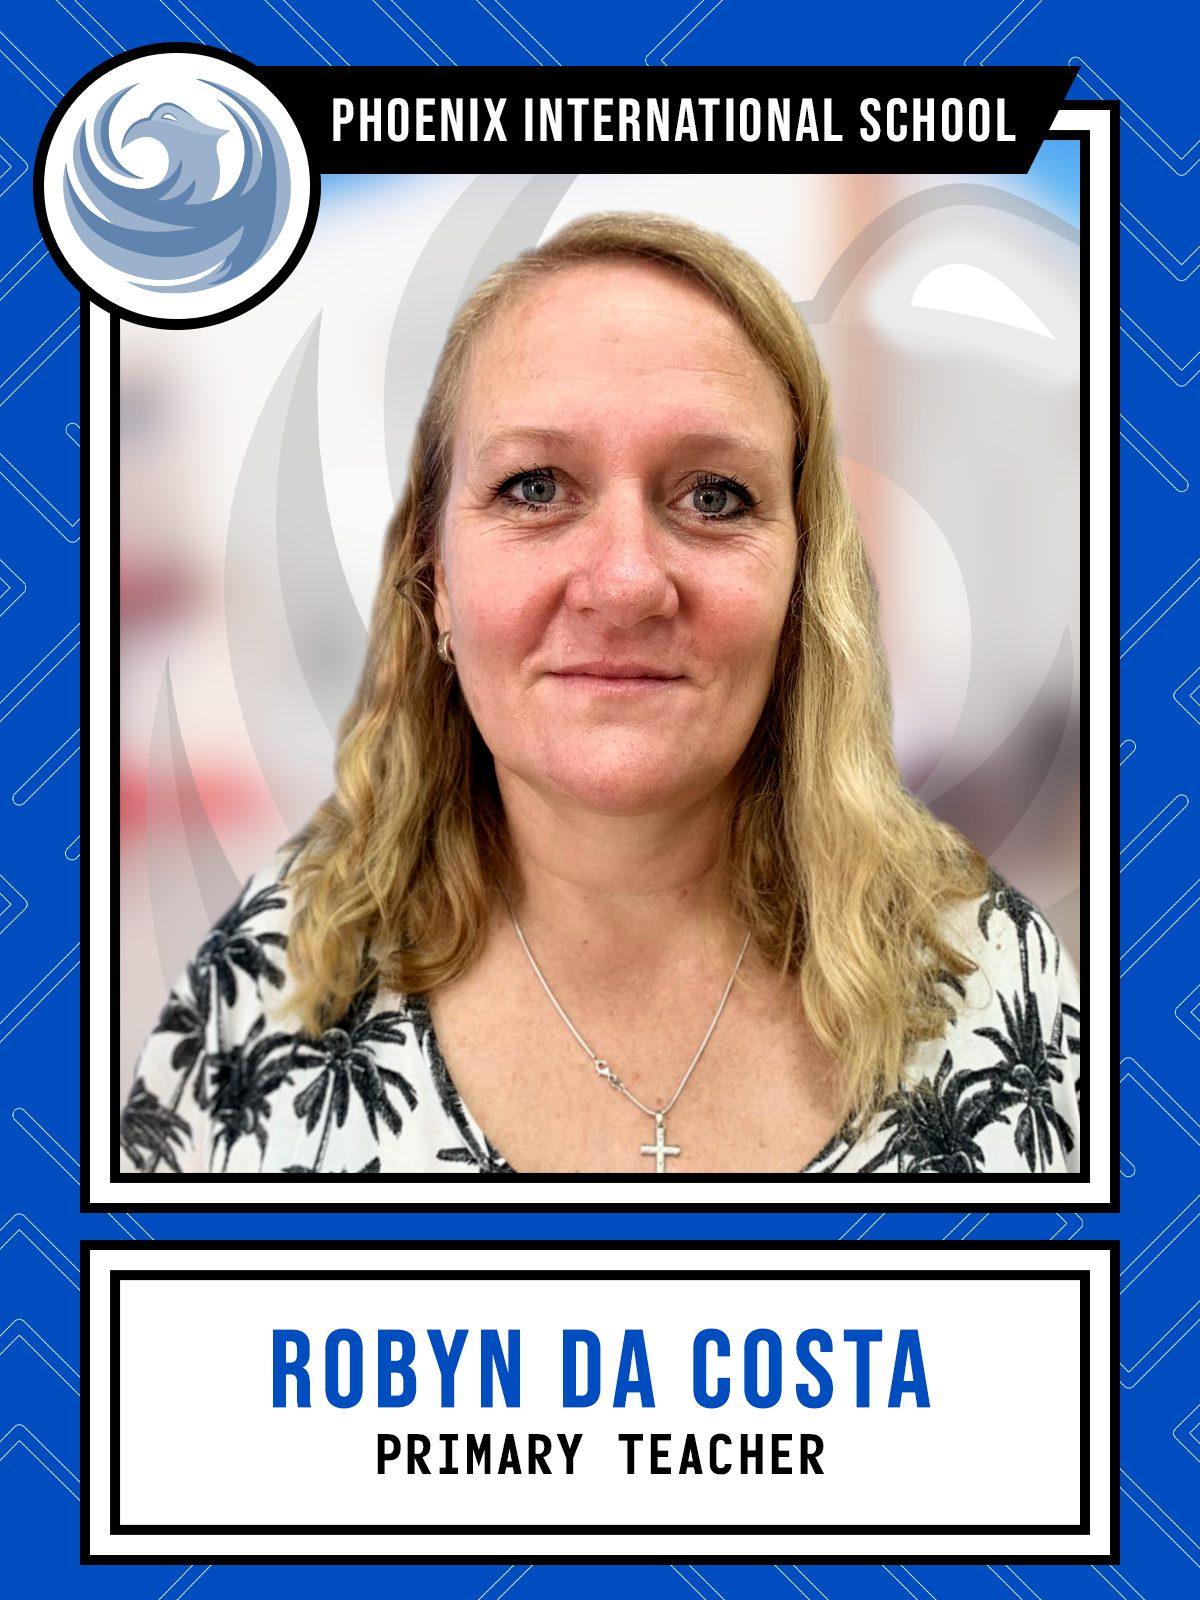 Robyn Da Costa - Primary Teacher